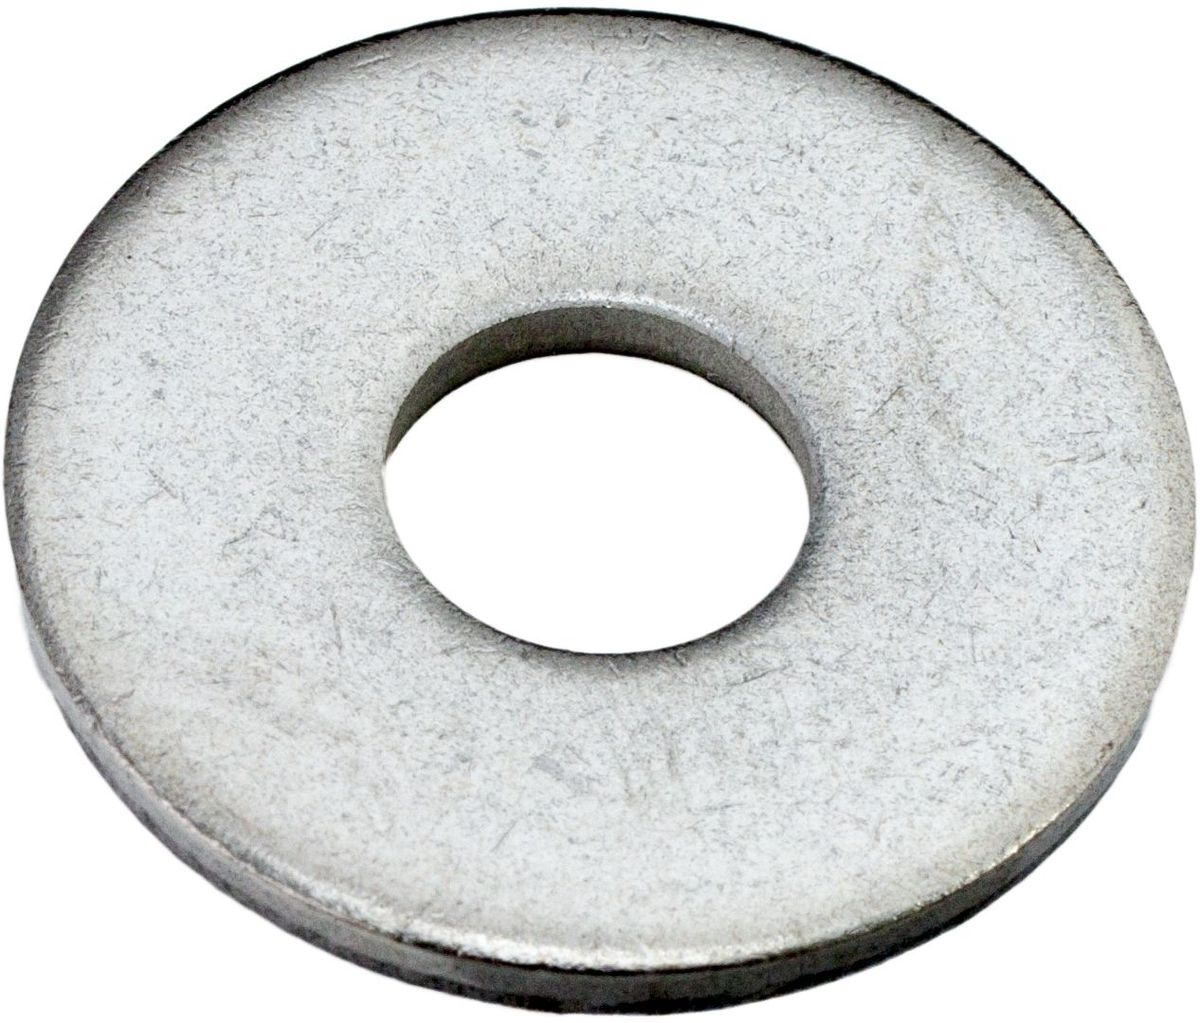 Шайба Стройбат, оцинкованная, кузовная, DIN 9021, 3 мм, 30 шт шайба стройбат din 125a 4 мм 500 шт